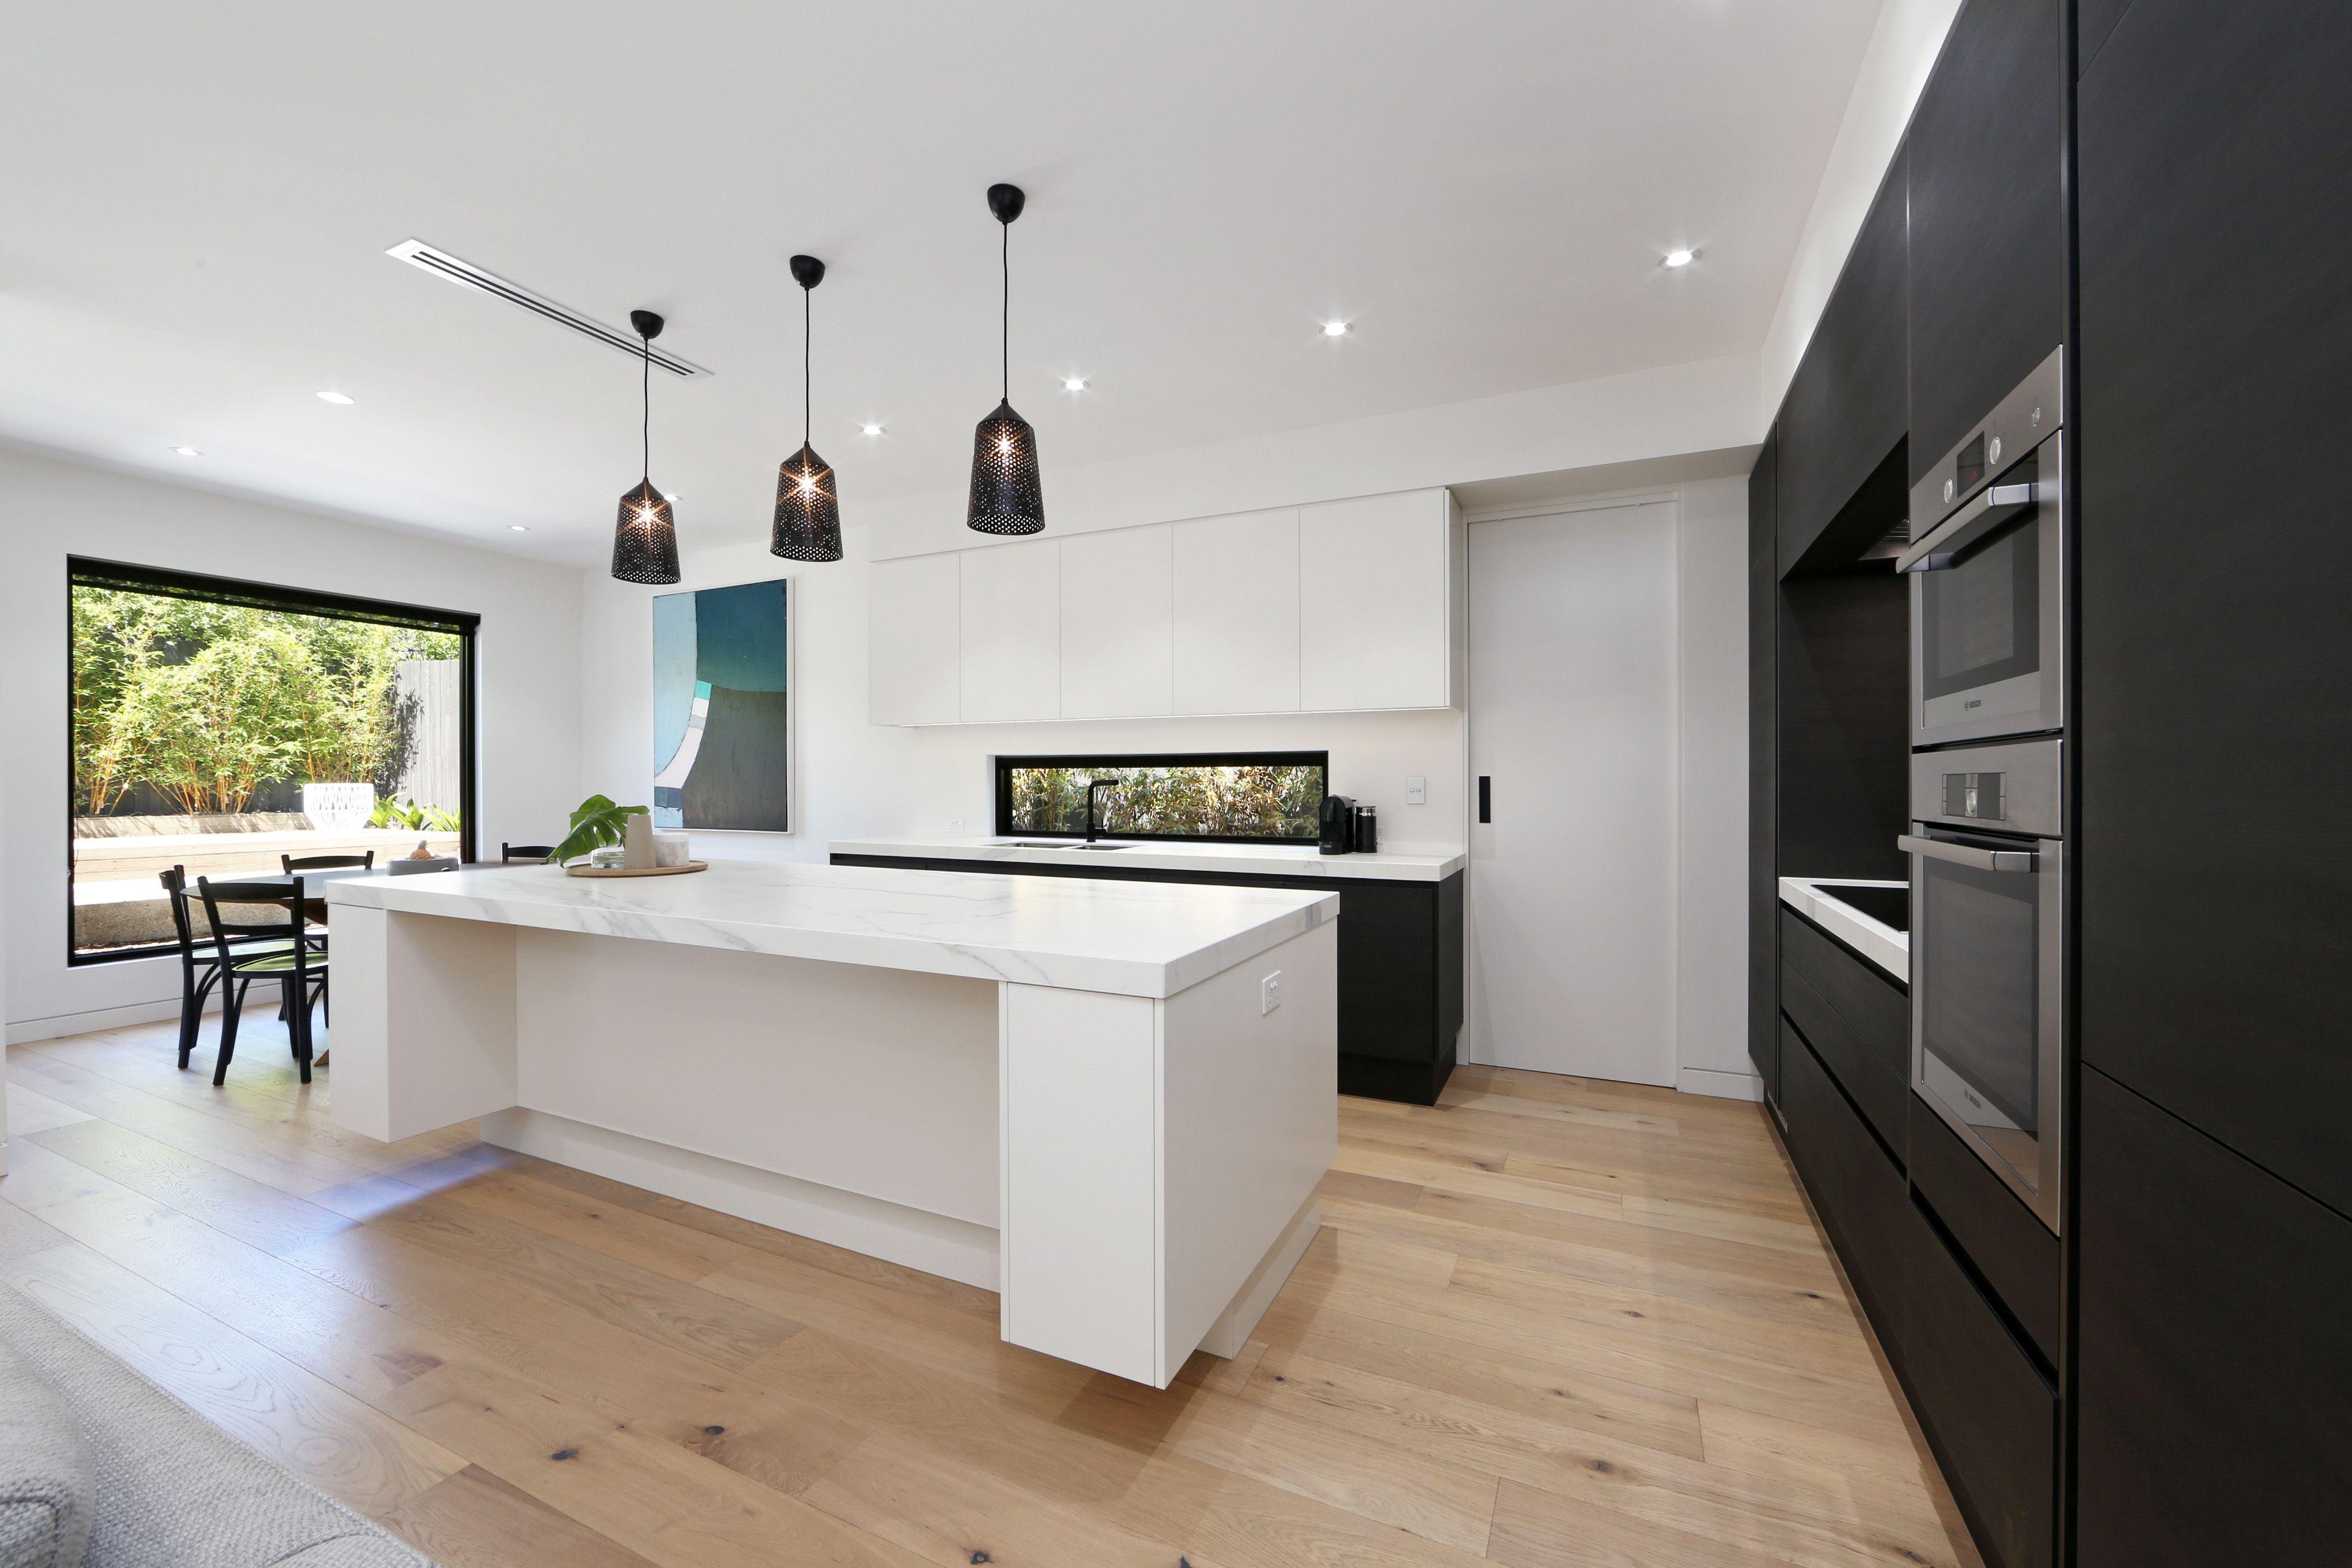 Navurban Ravenswood Design By Melbourne Contemporary Kitchens Nav N A V U R B A N